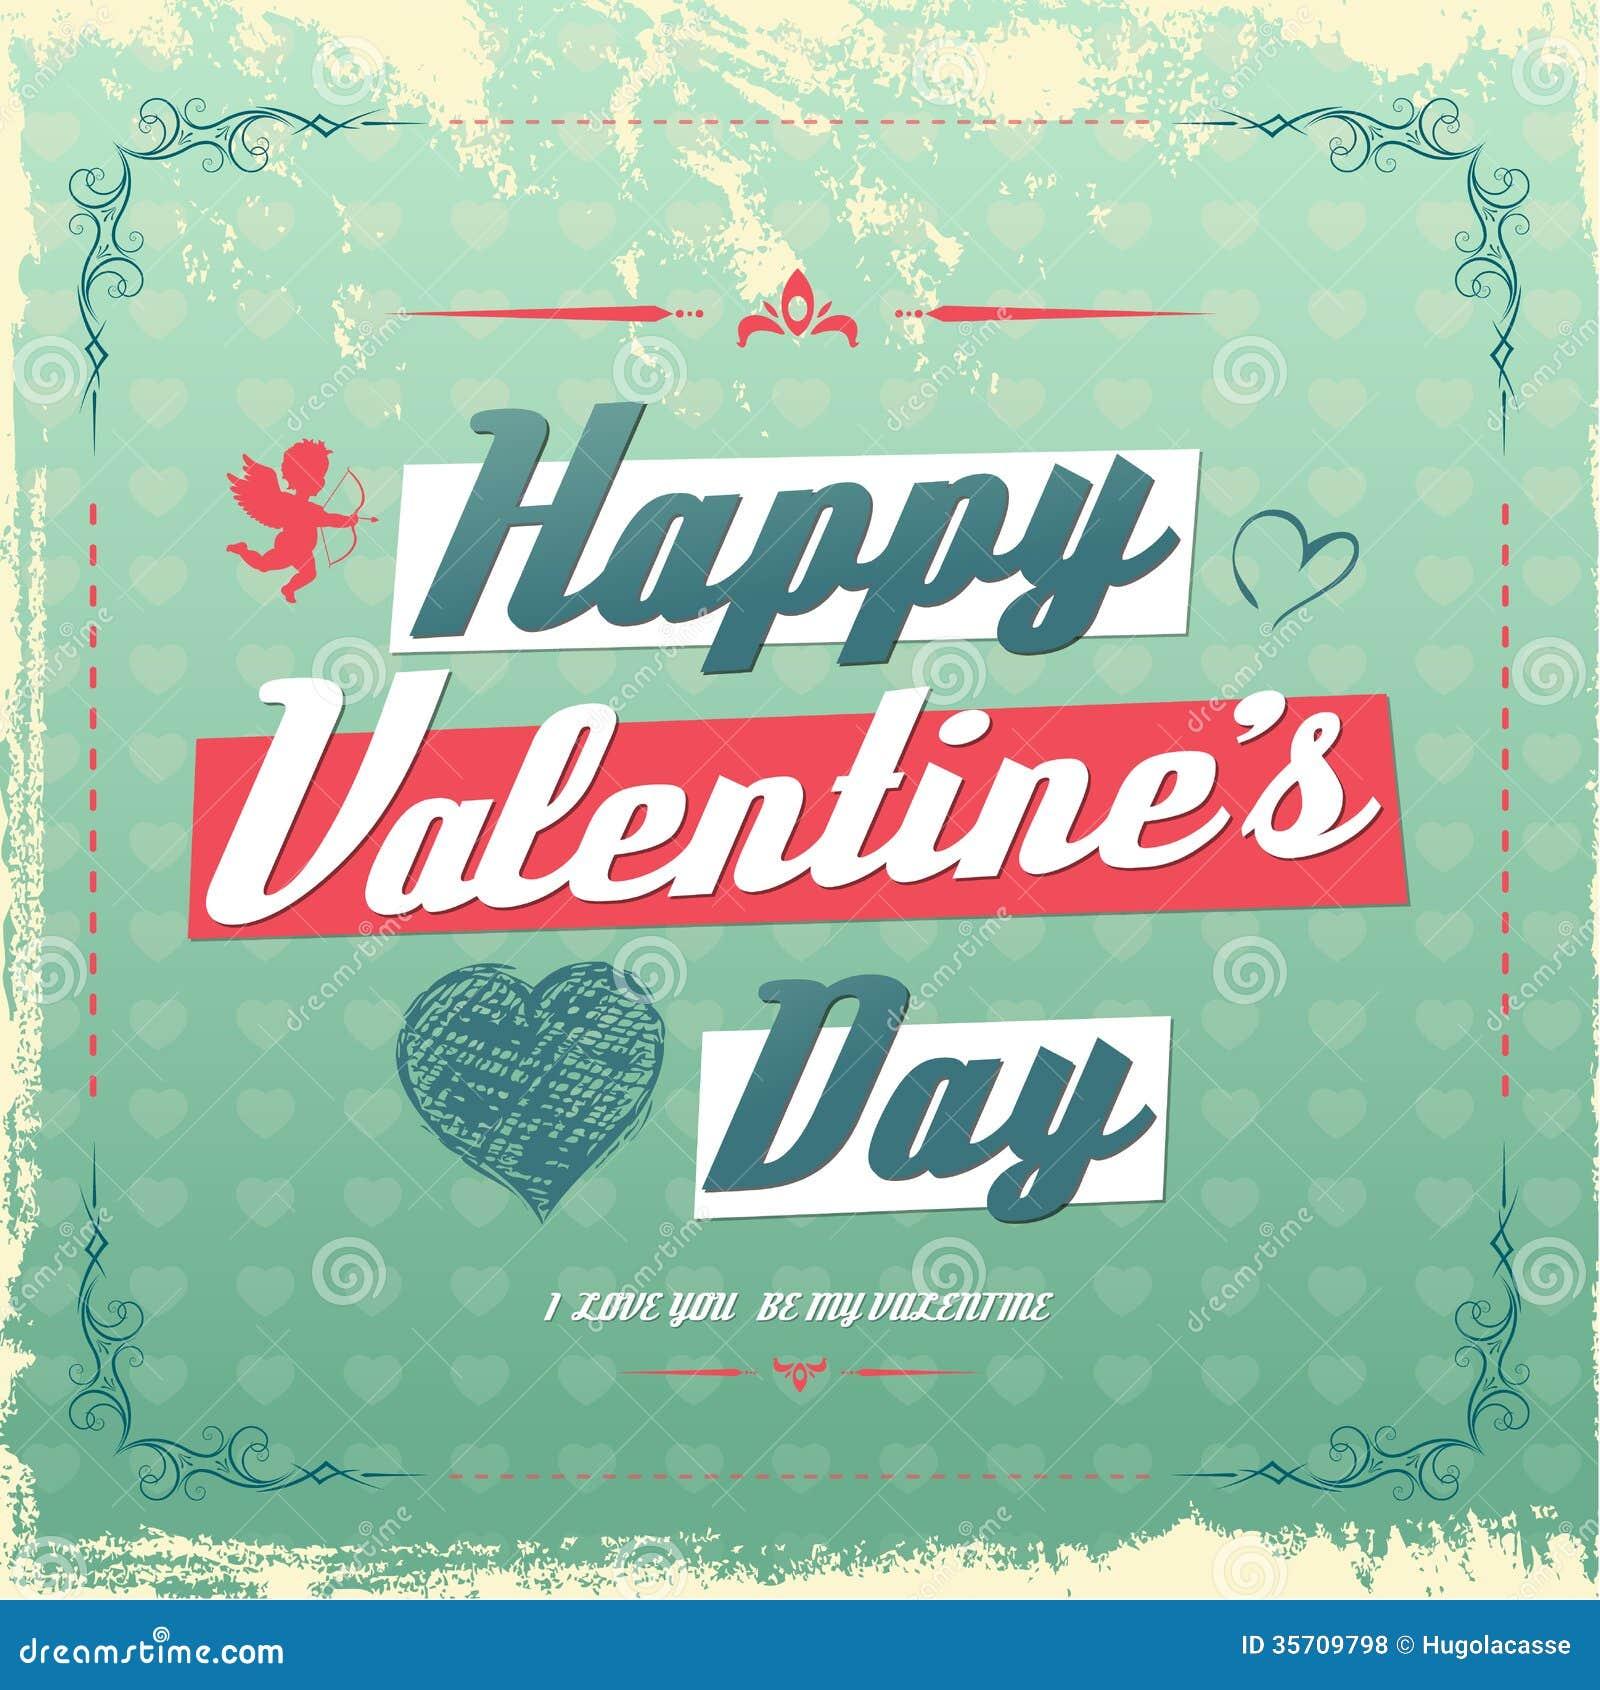 retro vintage valentine s day greeting card design - Vintage Valentines Day